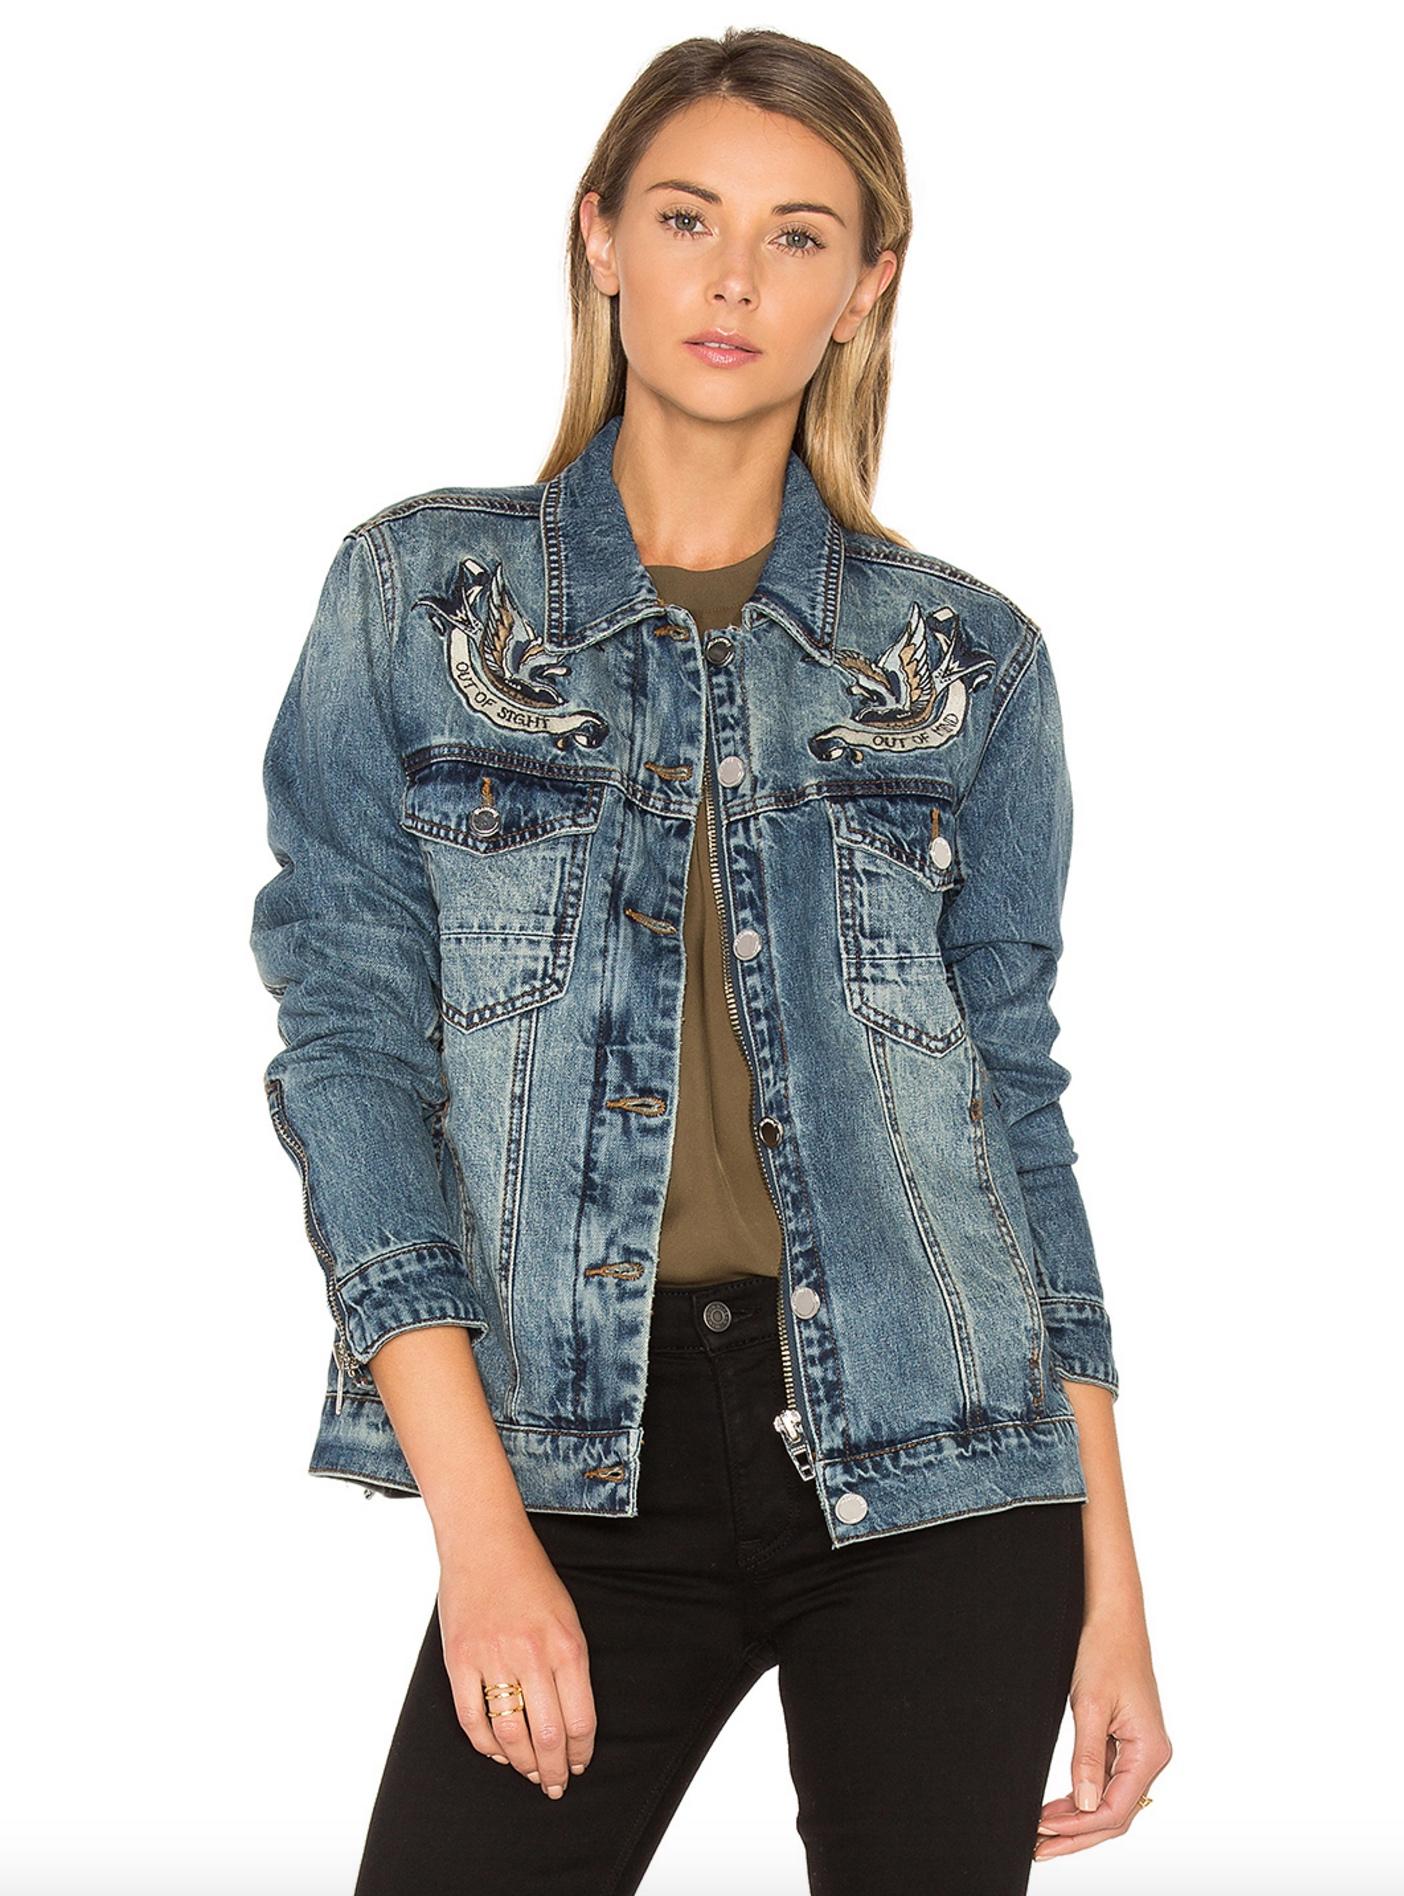 Blank NYC denim jacket $169